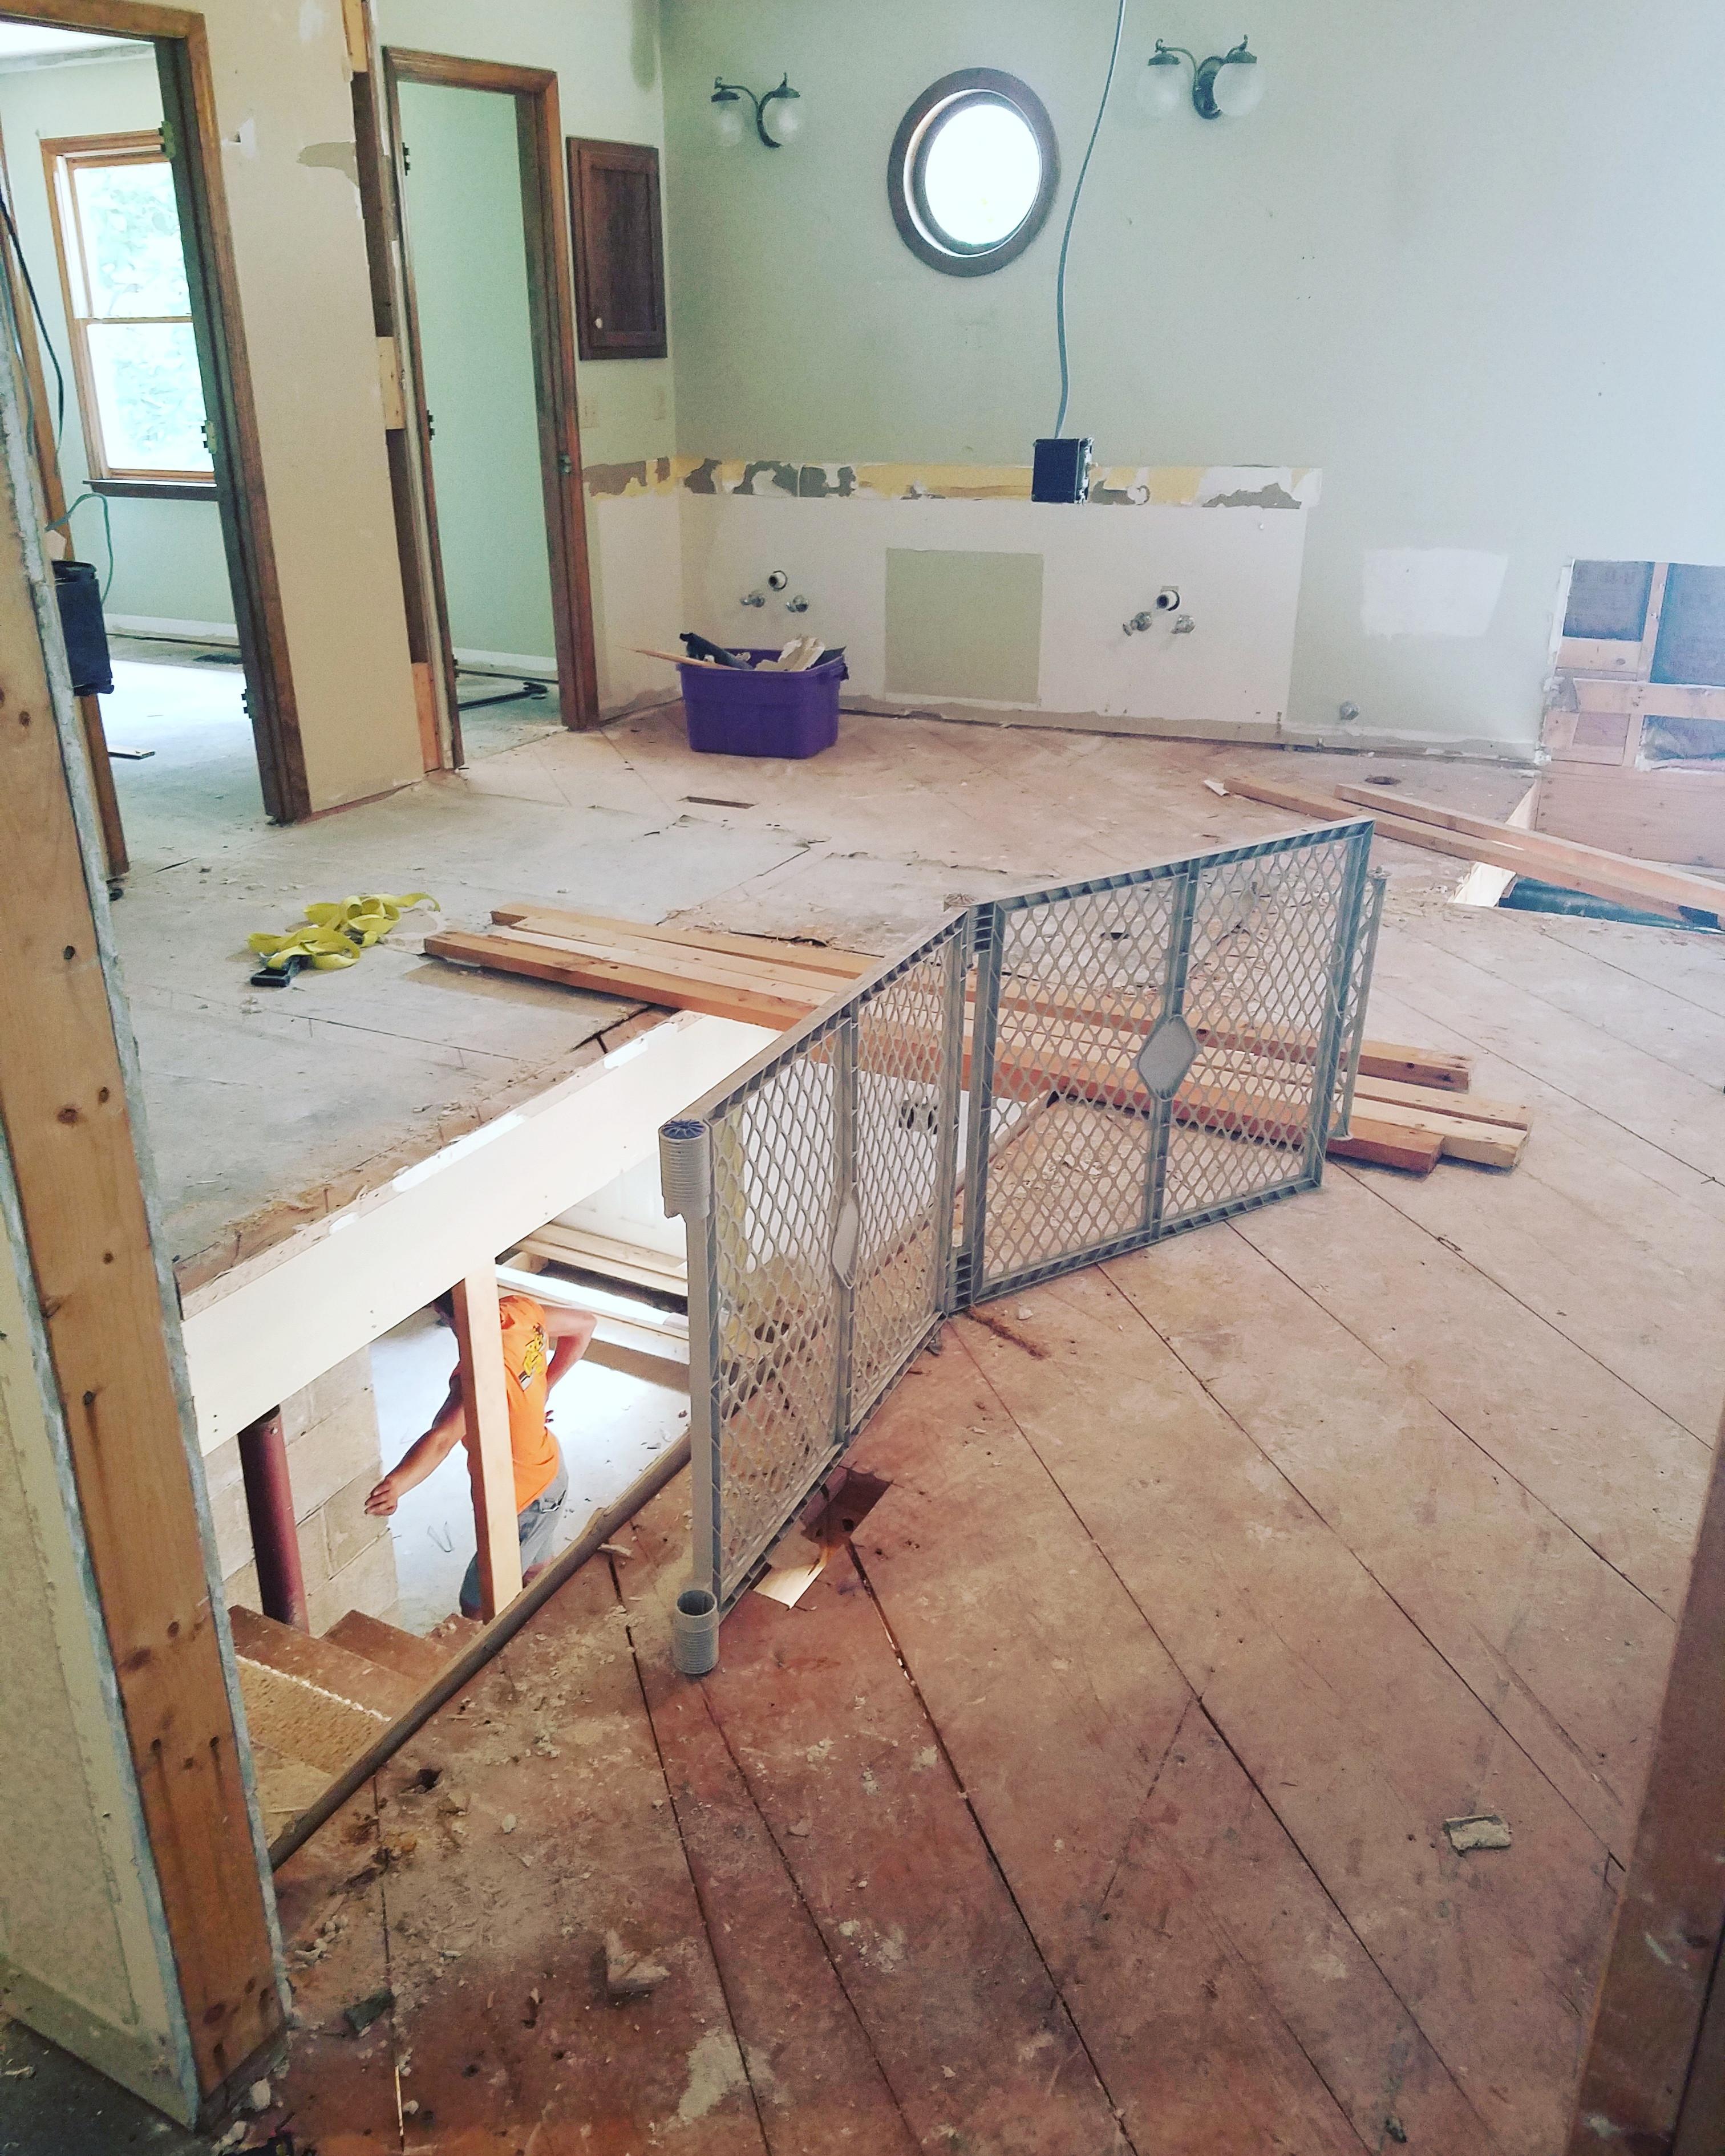 hardwood floor refinishing east brunswick nj of http imgur com gallery wcl2k daily http imgur com hffy1te within 1yr8eyt